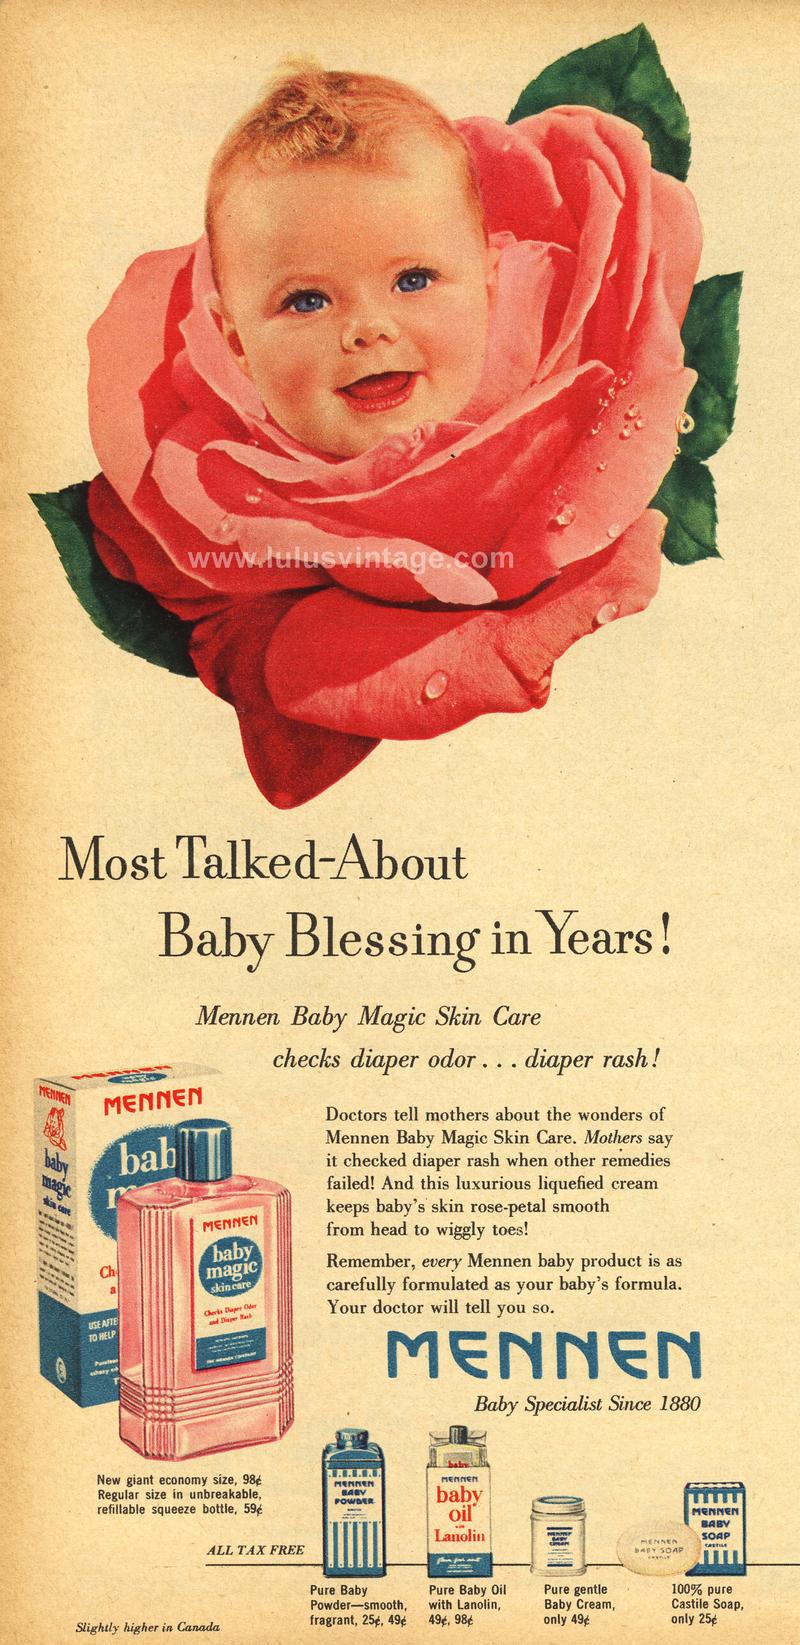 Vintage Baby Ads